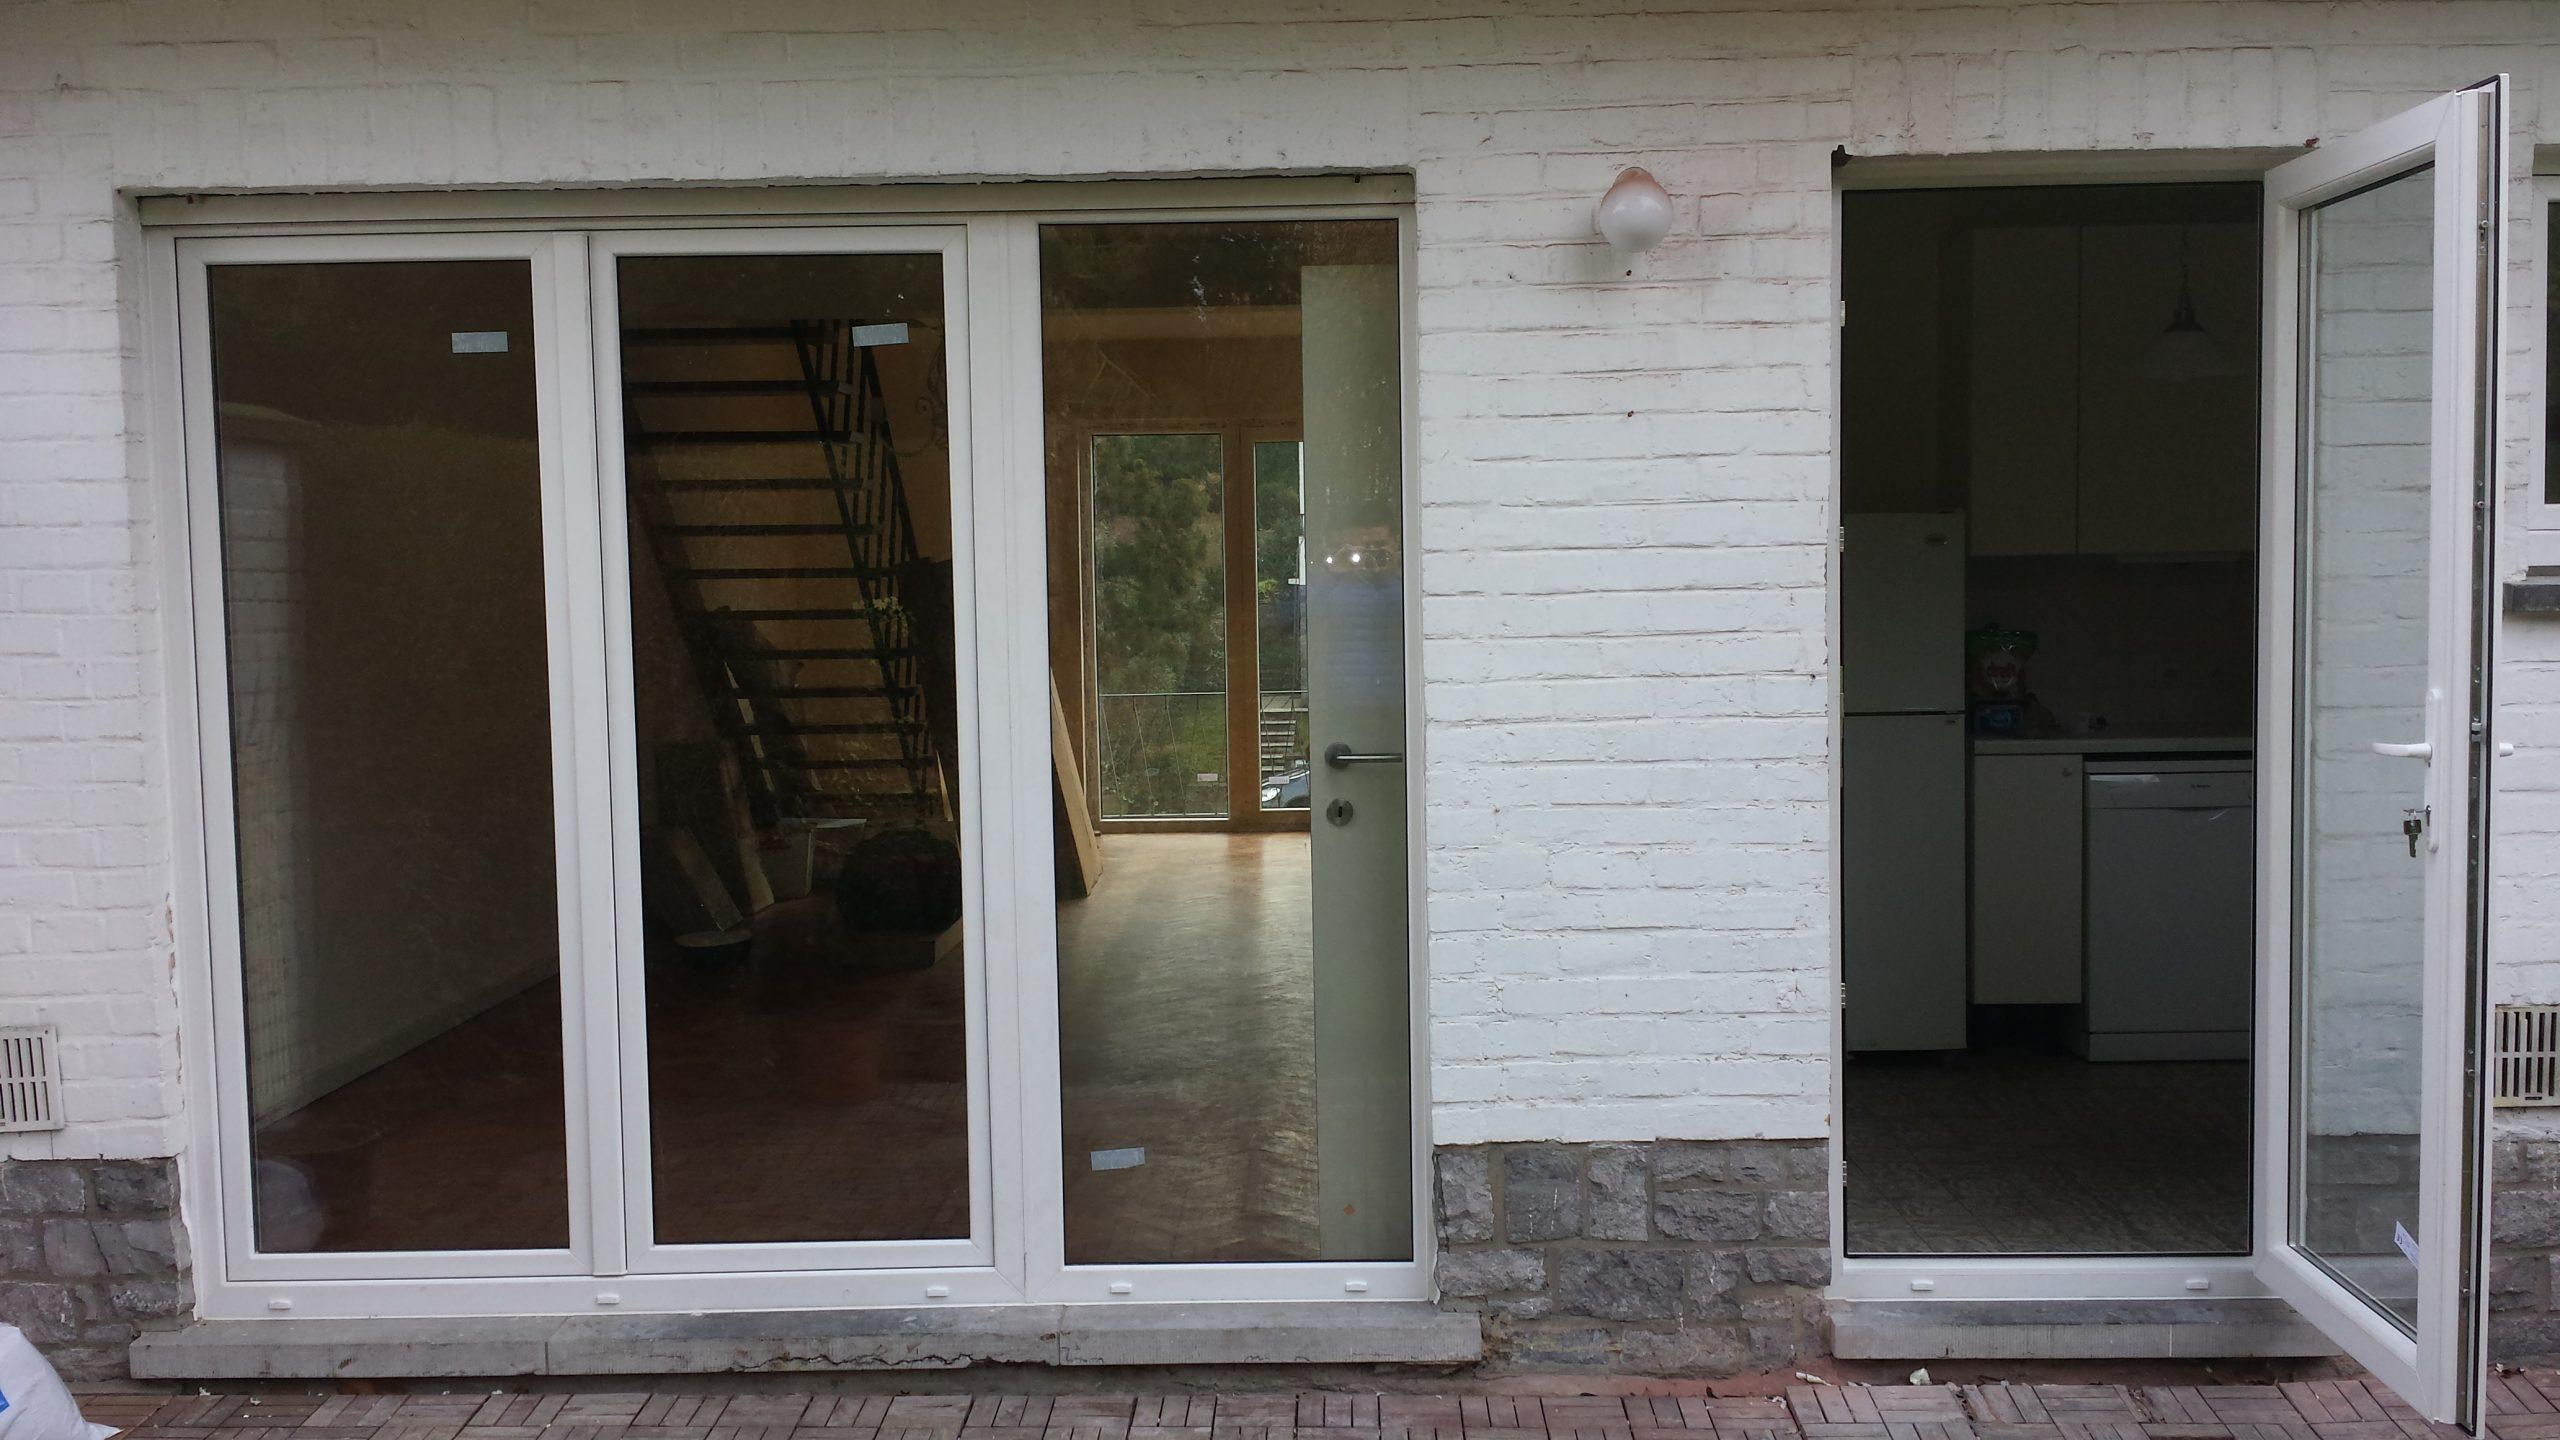 Porte fenetre pvc blanc ral 9016 vitrage securit chassis pvc - Voilage vitrage porte fenetre ...